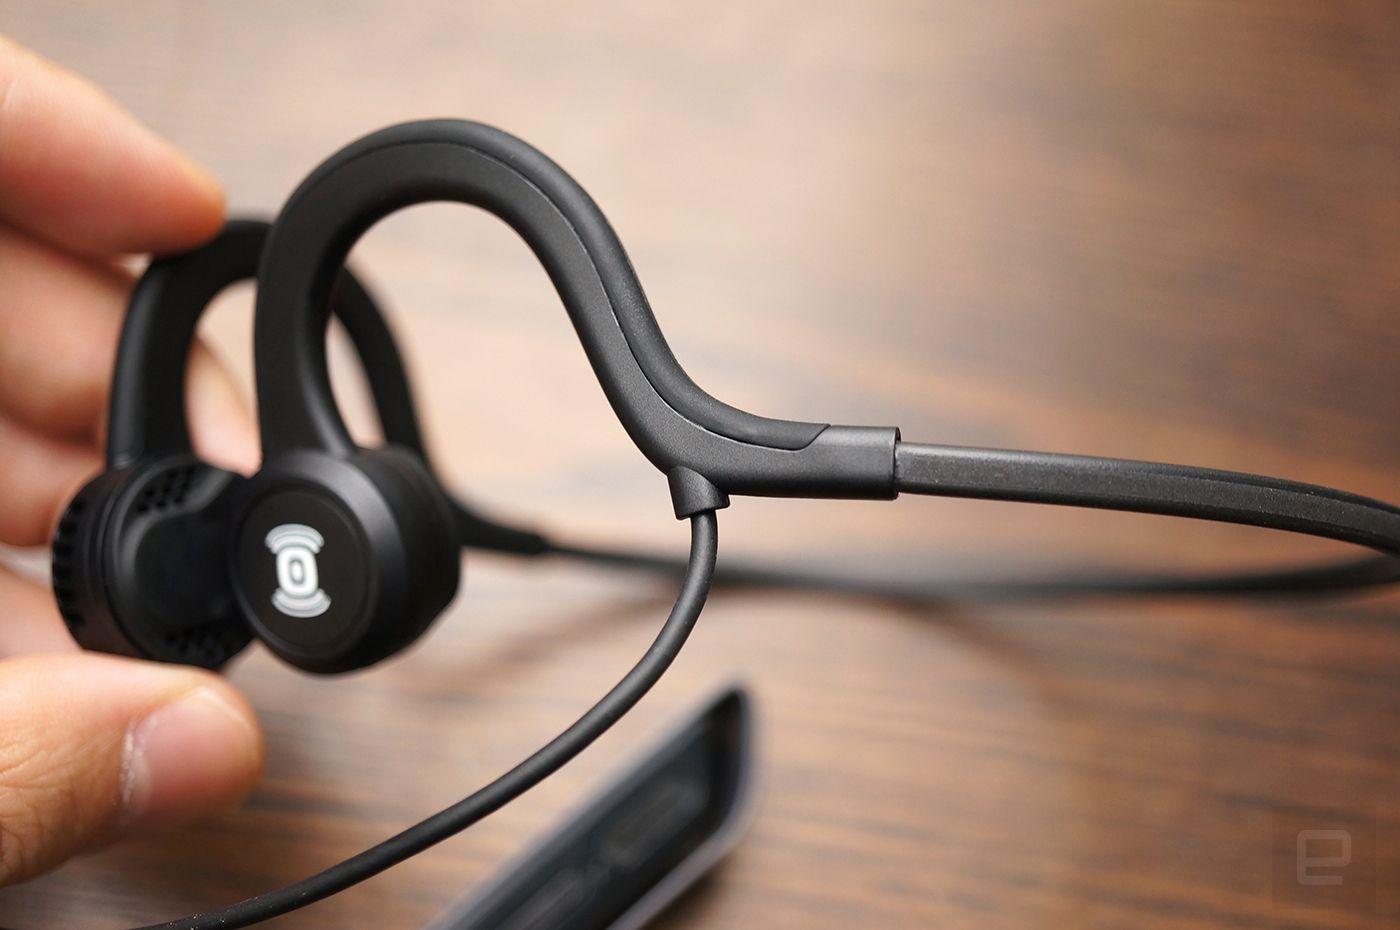 Aftershokz Breez Titanium Razer Hammerhead Bt Bluetooth Wireless Premium Gaming Earphone Headset Headphone Explore Tech News And More